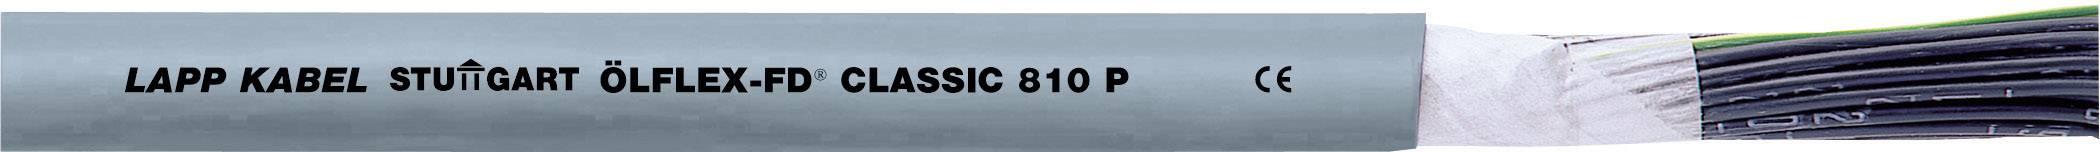 Tažný kabel LappKabel ÖLFLEX® FD CLASSIC 810 P 2X0,5 (0026300), 2x 0,5 mm², polyurethan, Ø 5,8 mm, nestíněný,